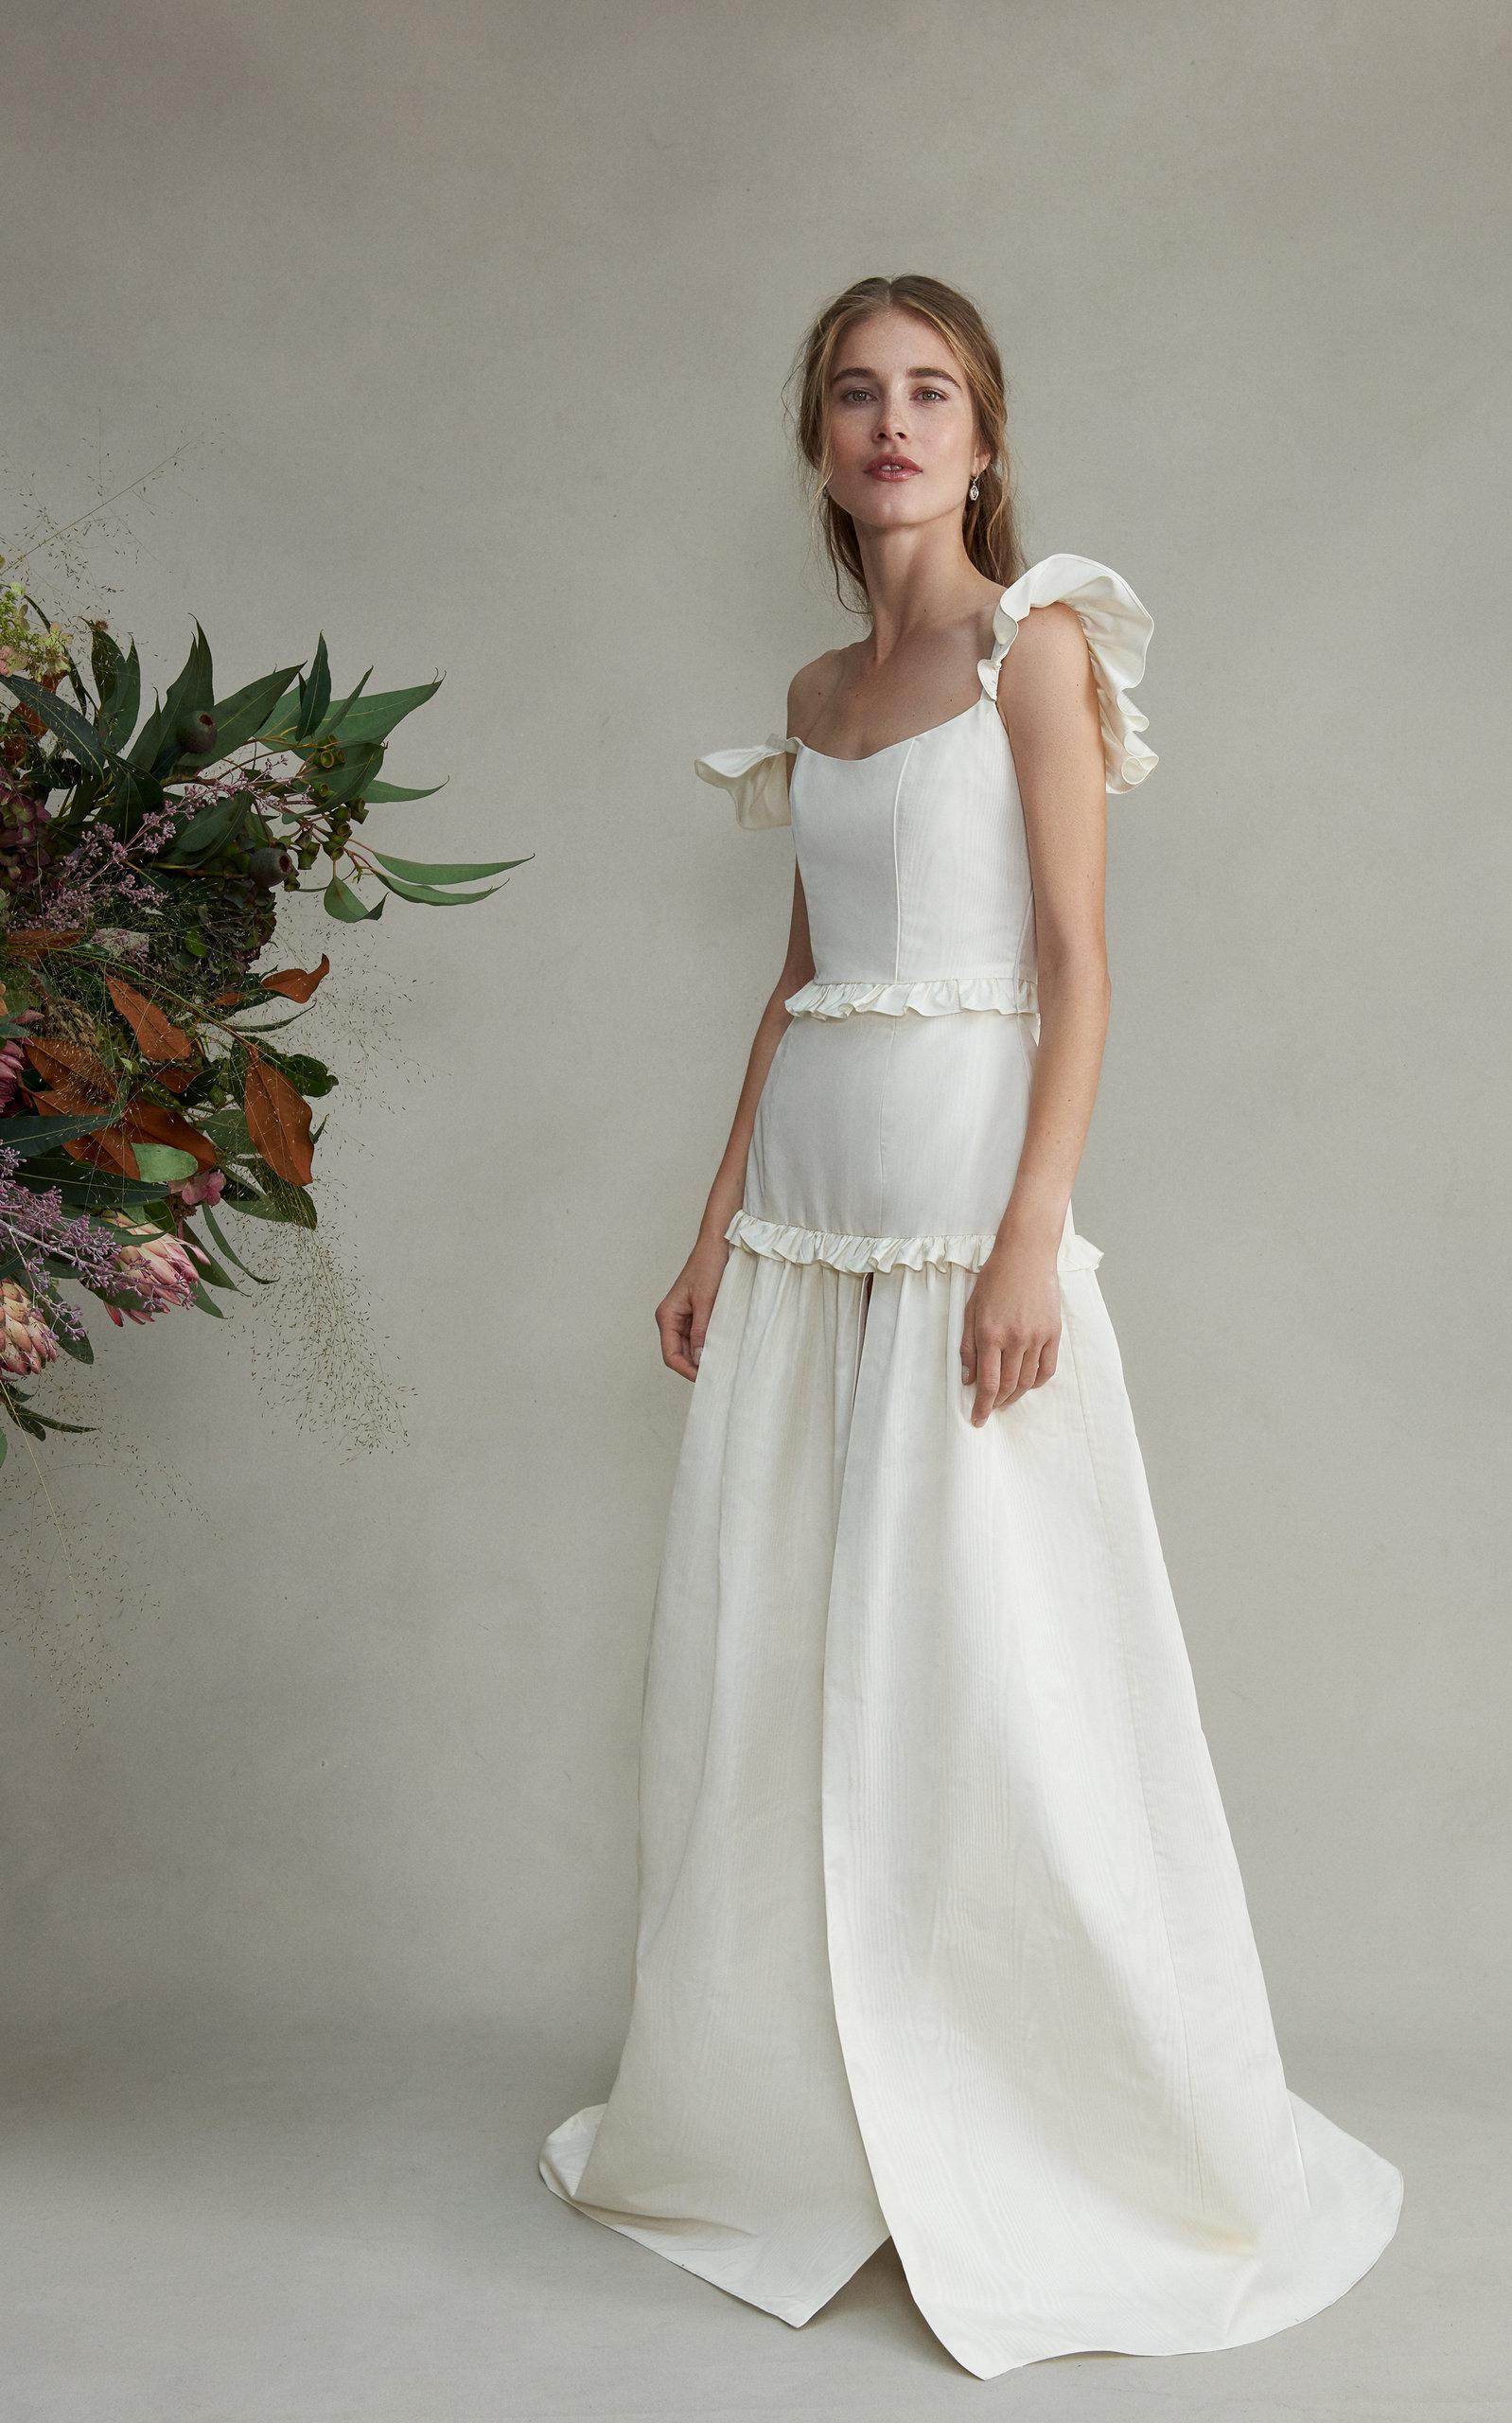 MARKARIAN Arabella Silk Ruffle Gown With Leg Slit in White